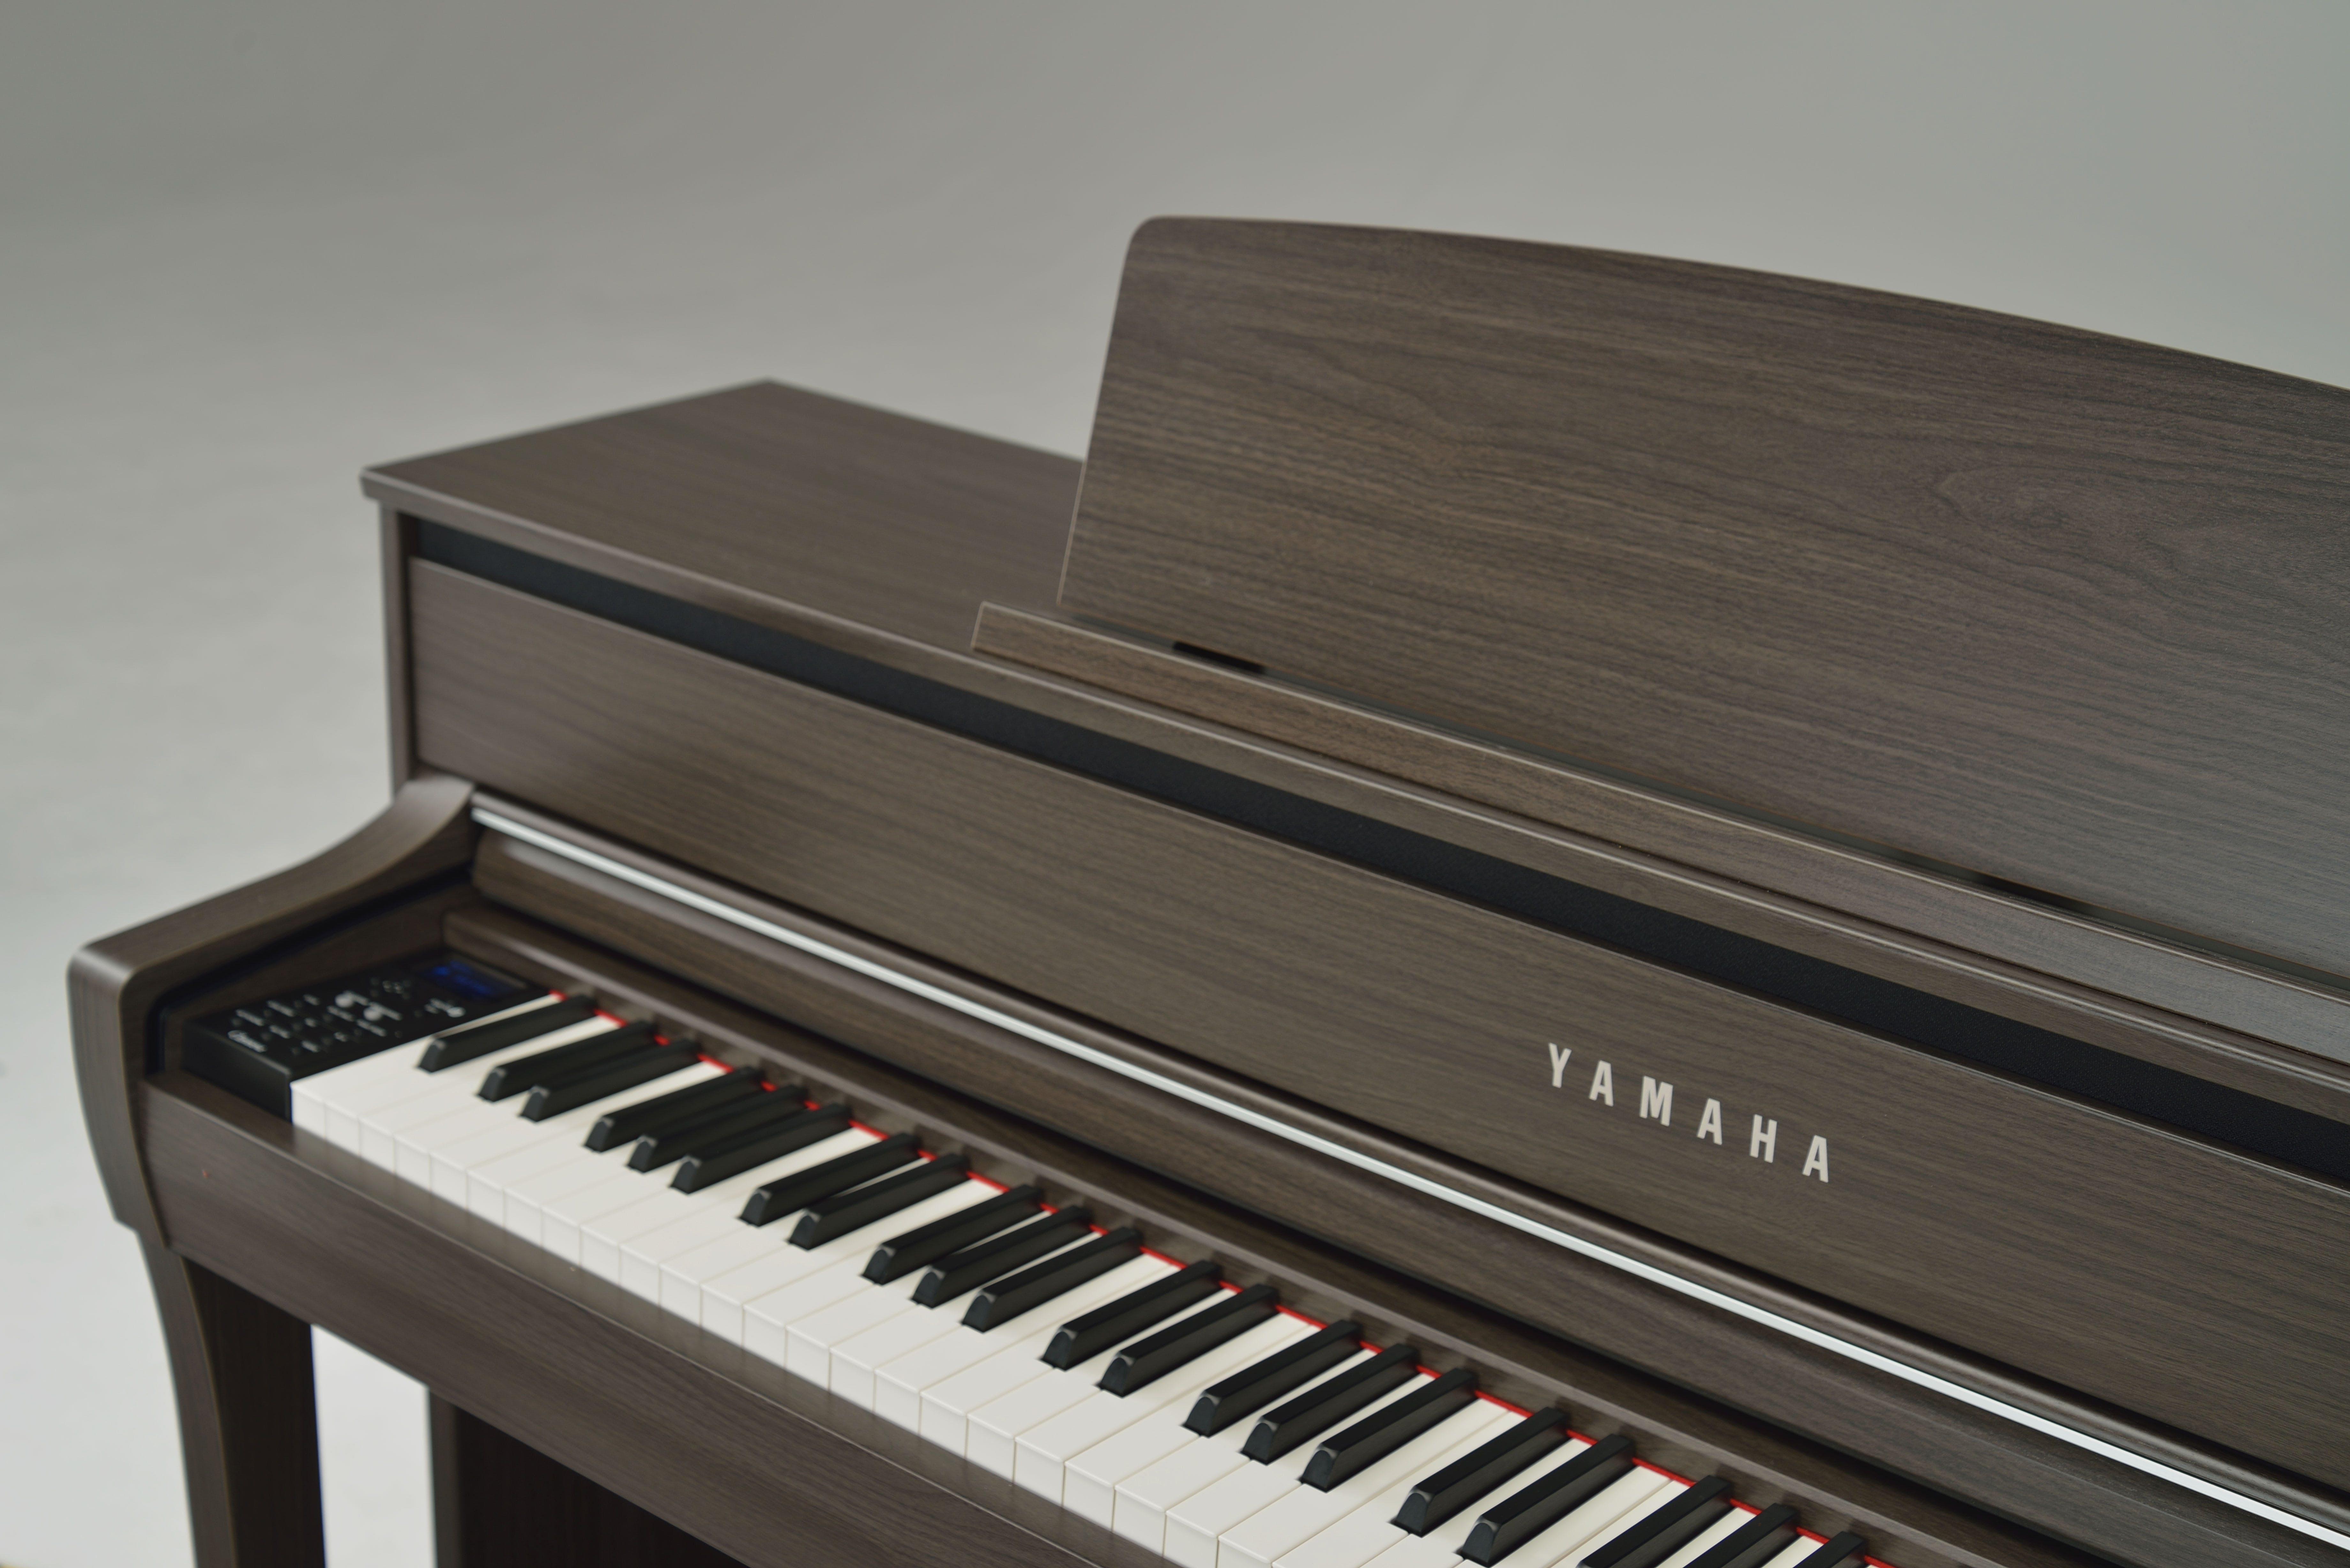 yamaha clavinova digital piano. yamaha clavinova clp675 home piano in dark walnut digital